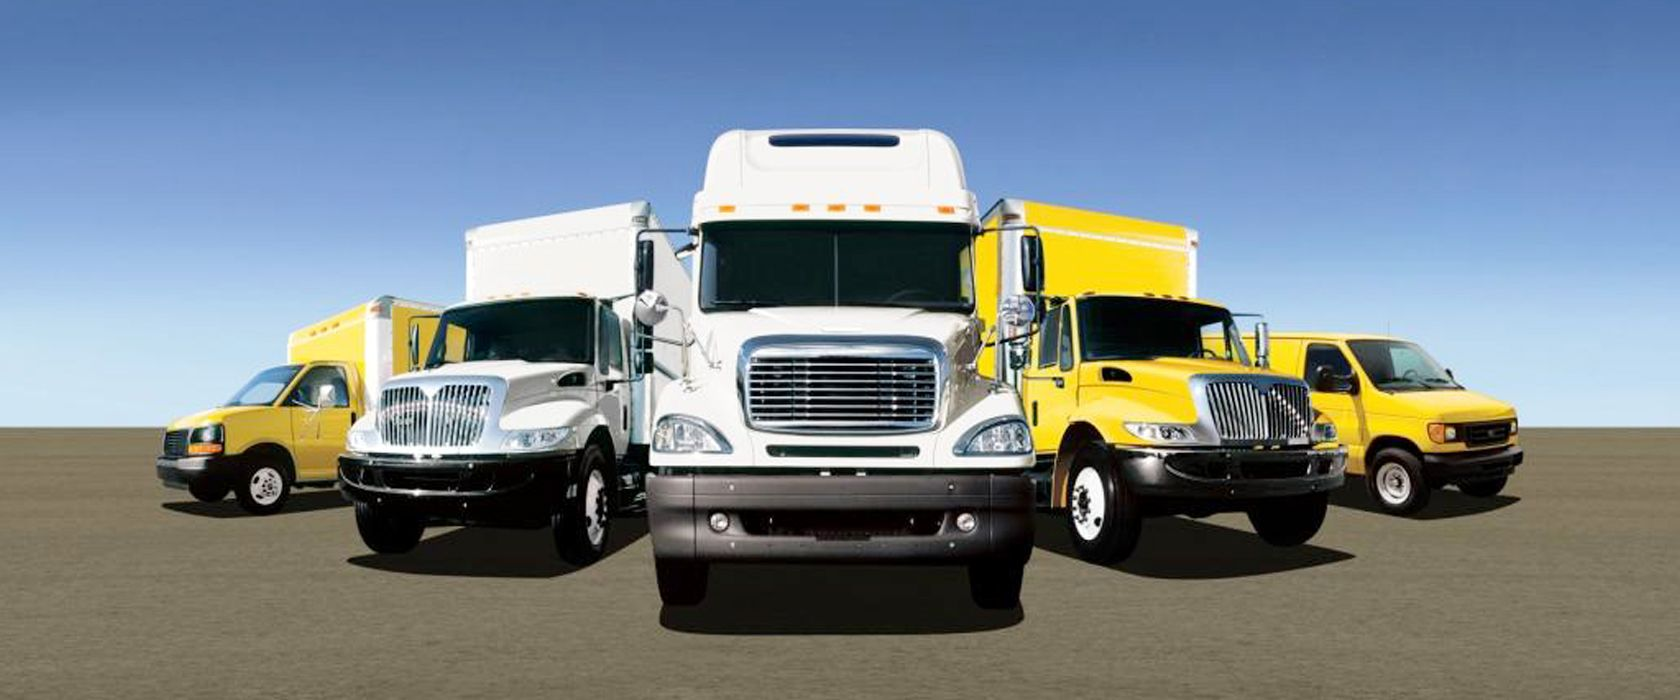 AAA Truck Wash located in Missouri, California and Texas